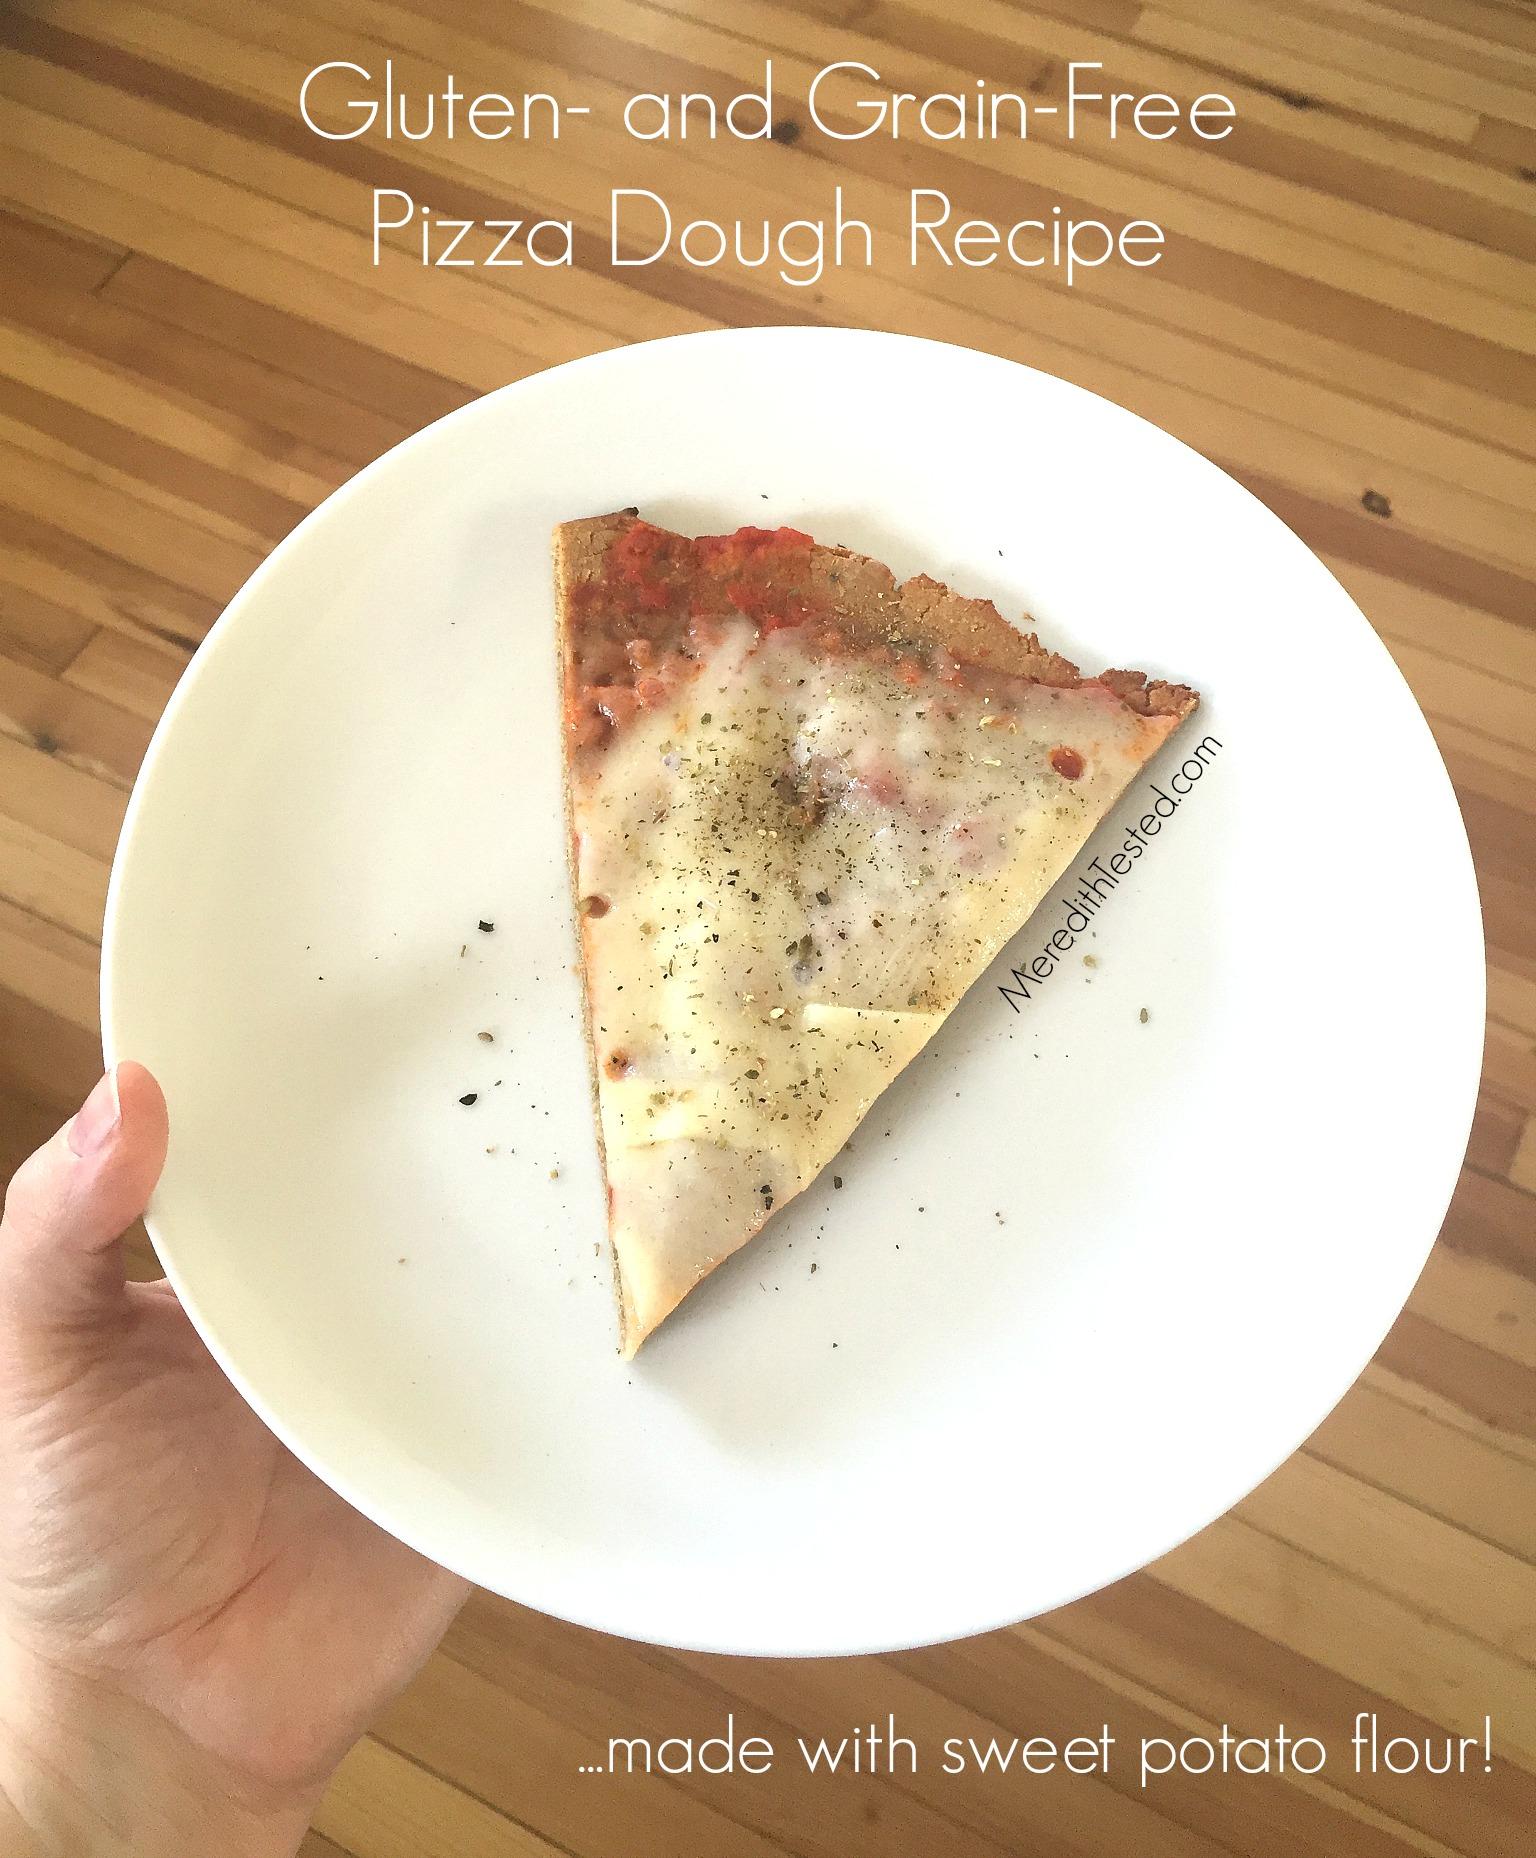 Sweet potato flour pizza dough flatbread recipe